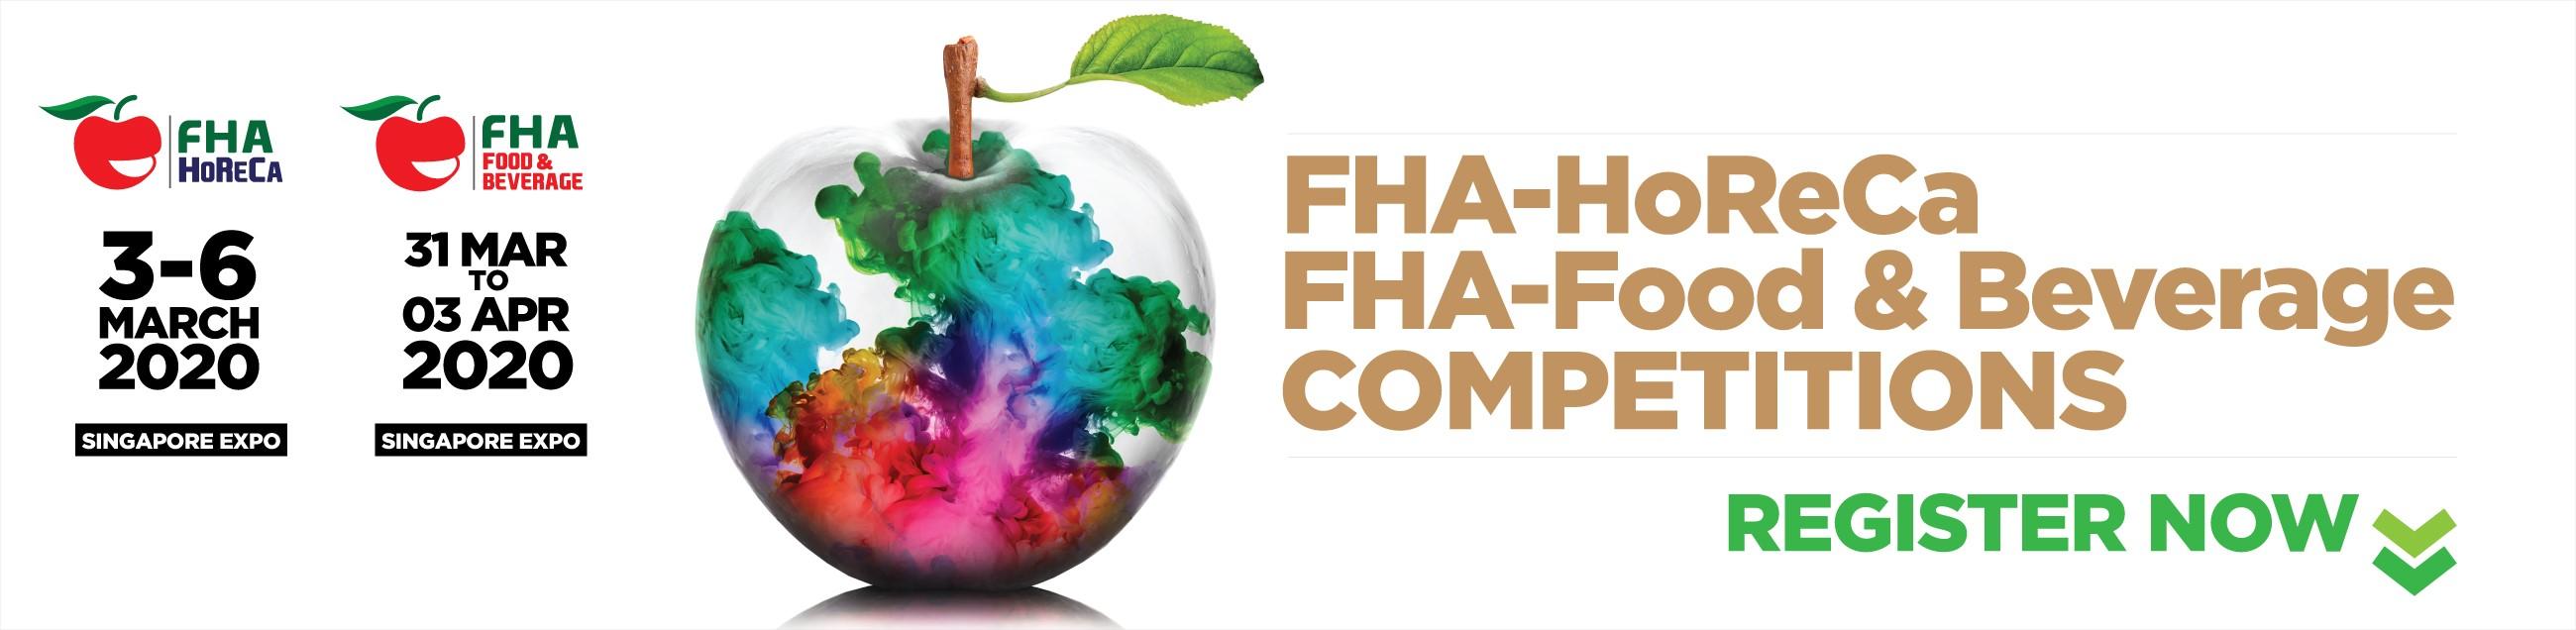 FHA-HoReCa and FHA-Food & Beverage Competitions 2020 | Judgify